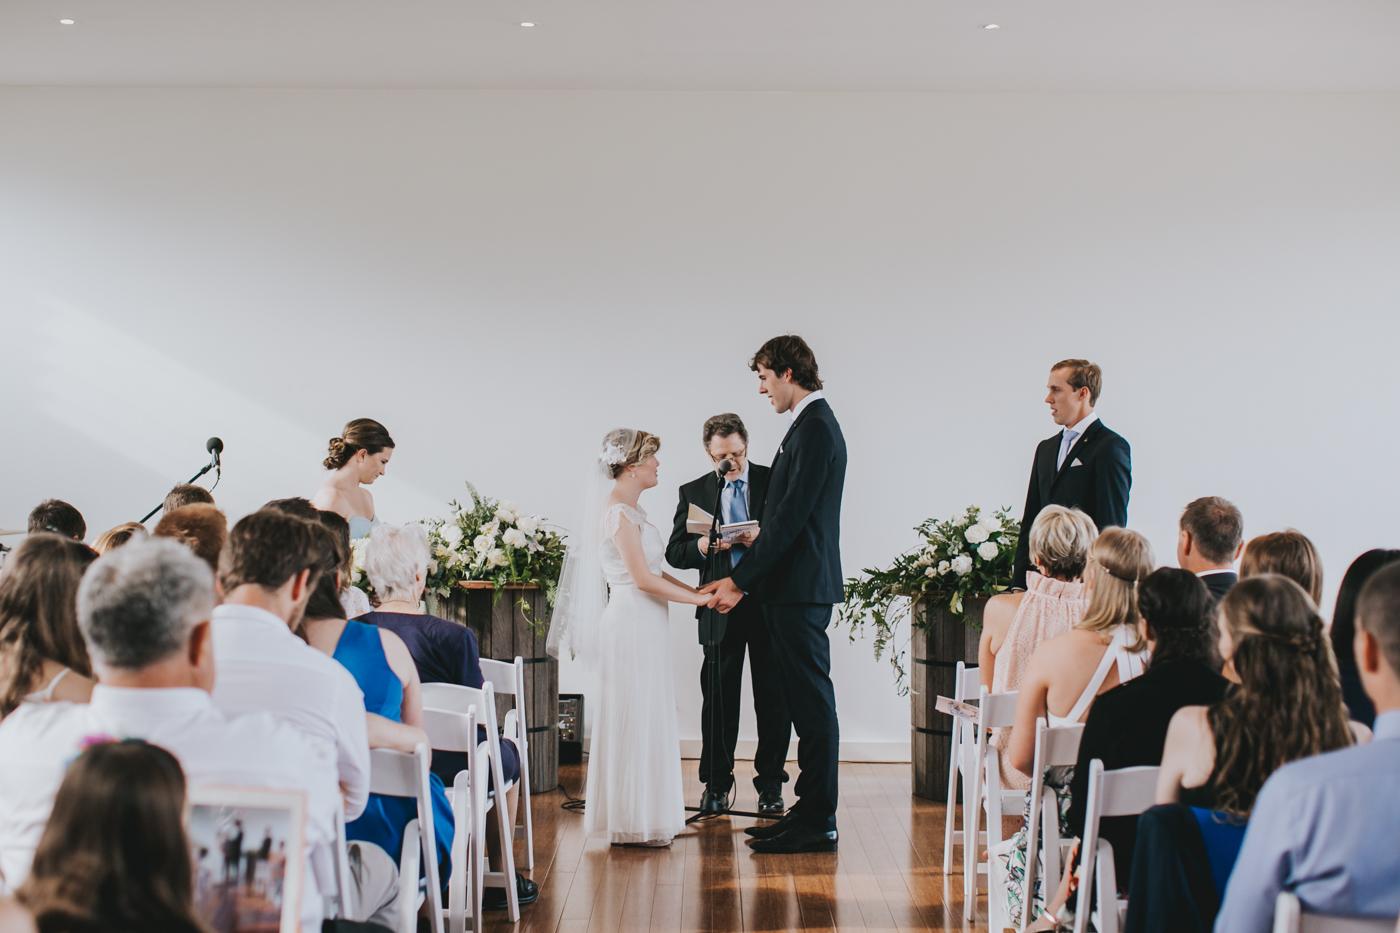 Rachel & Jacob - Willow Farm Berry - South Coast Wedding - Samantha Heather Photography-81.jpg